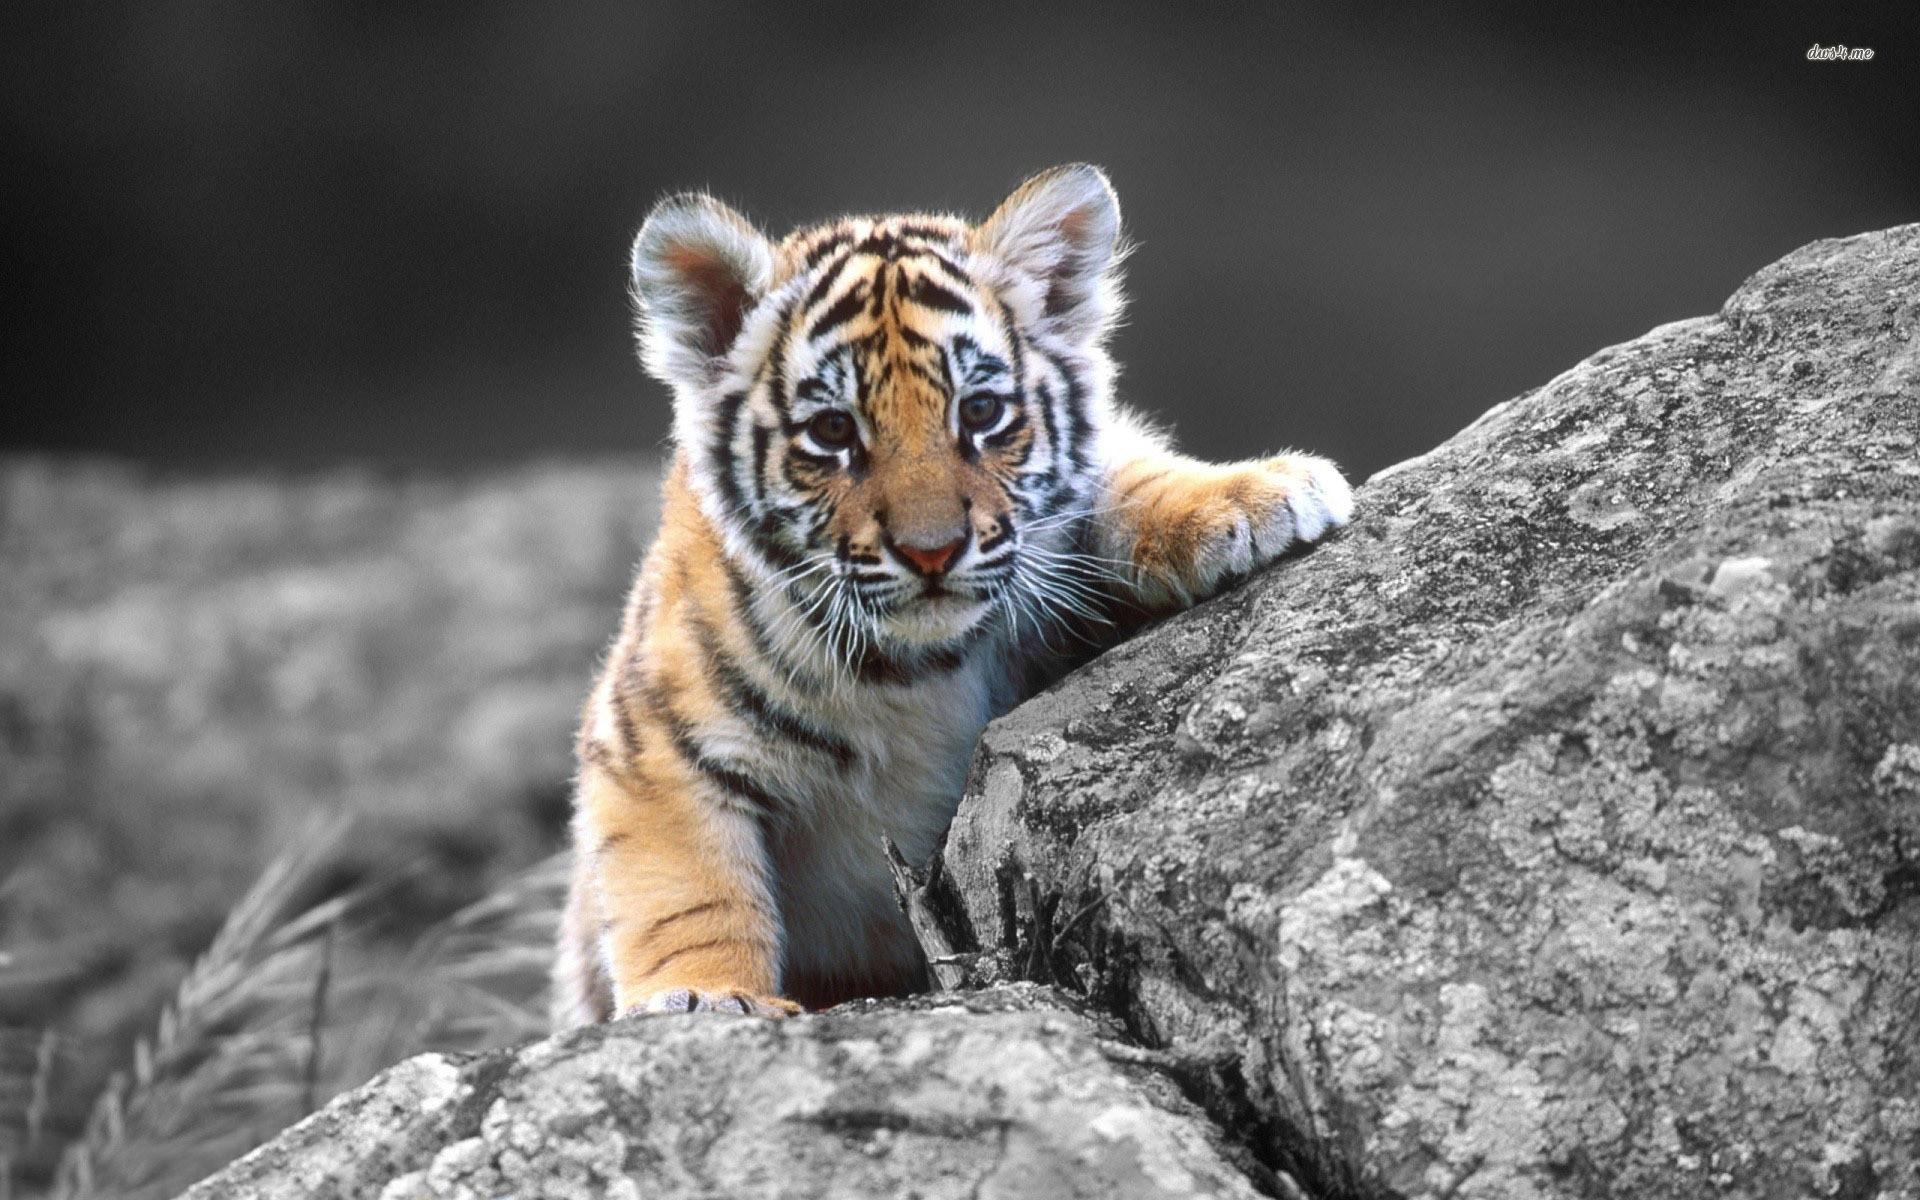 Aquarium Screensaver Free Download For Mac : Tiger mac wallpaper free  download